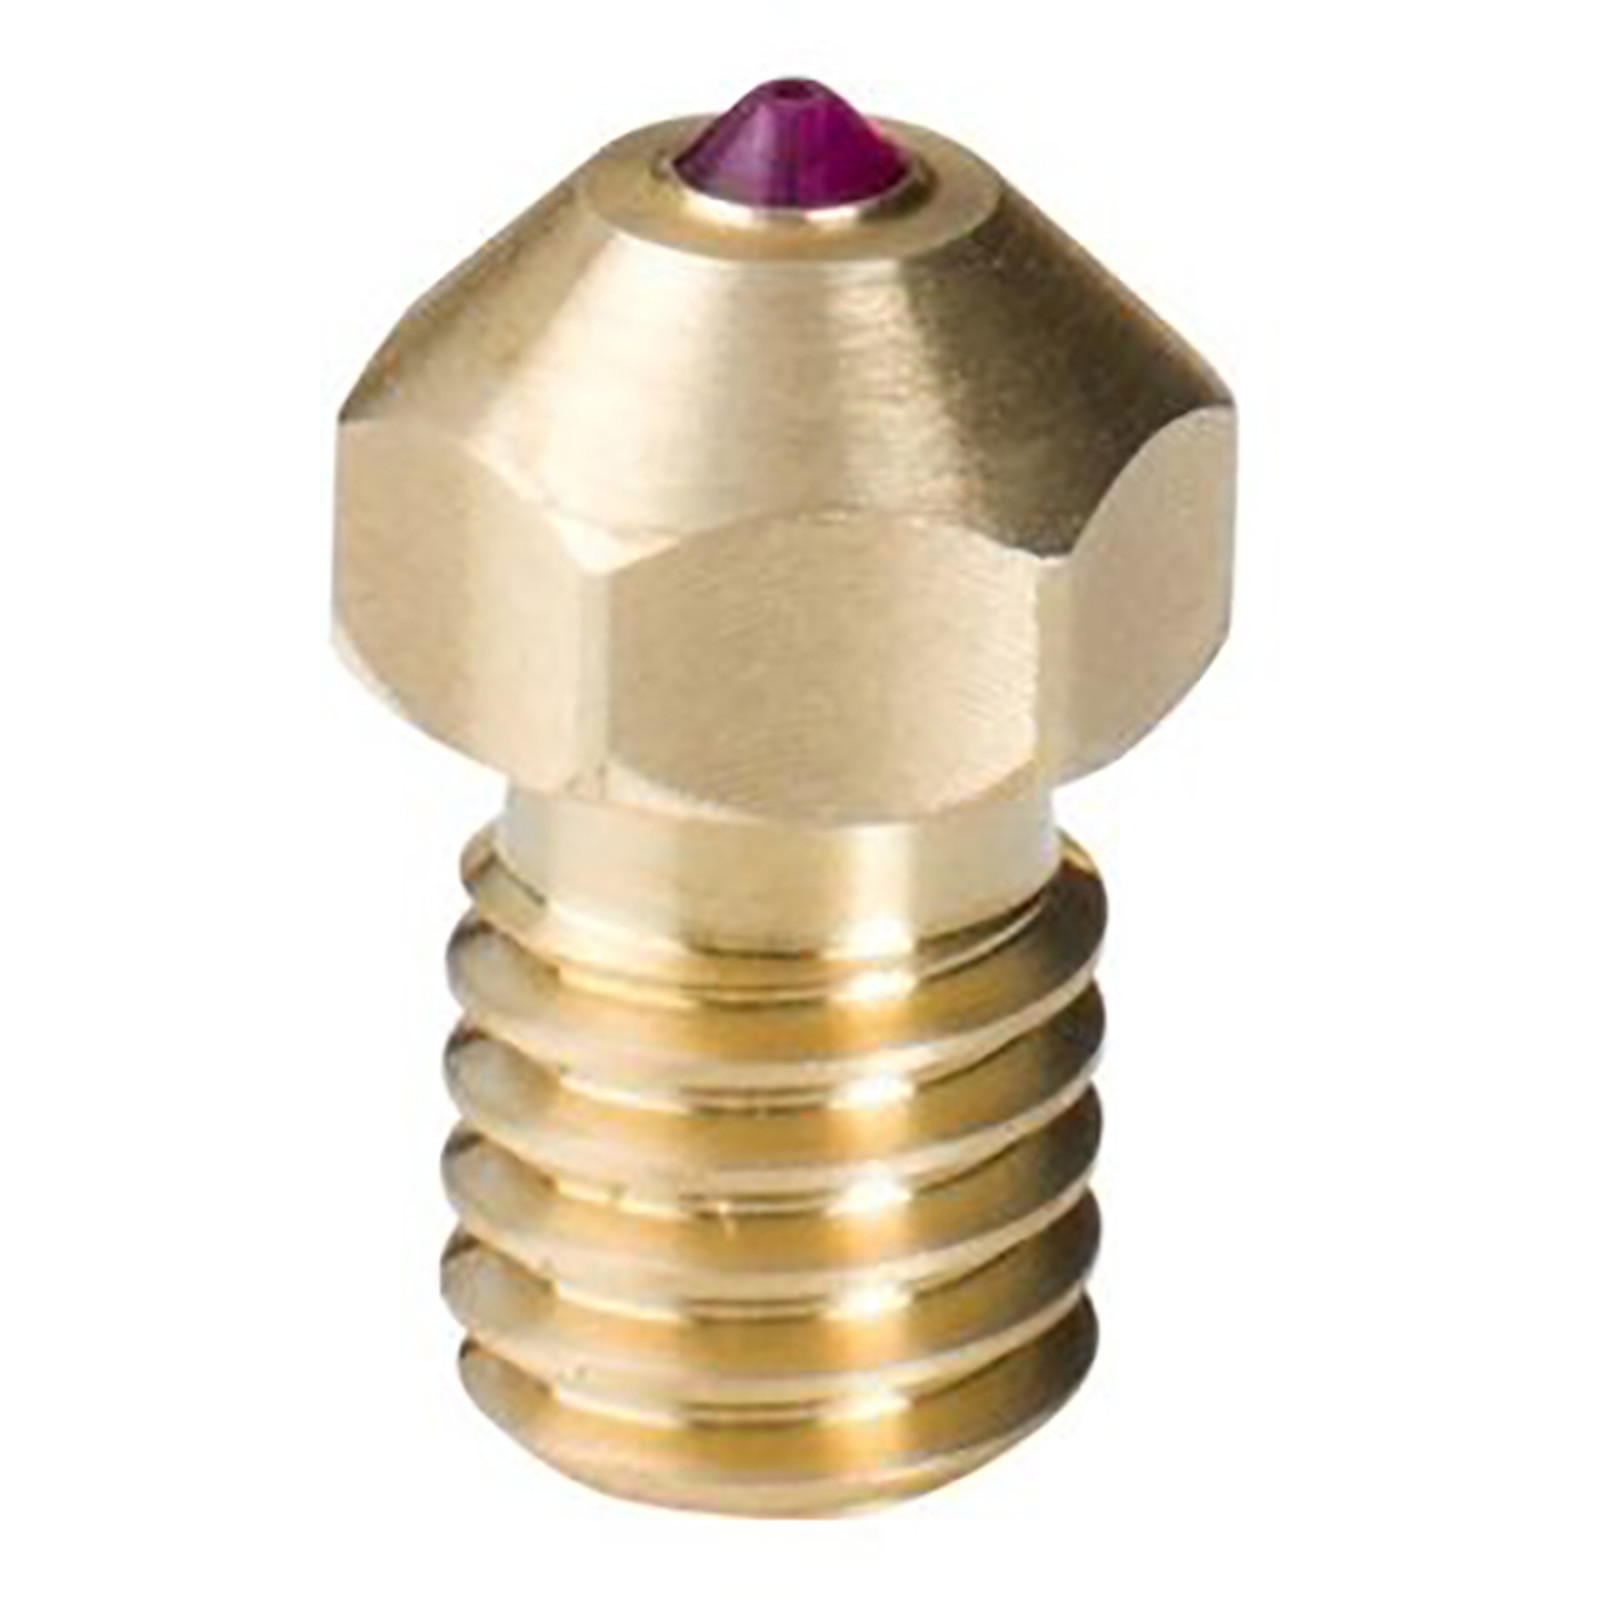 Ultimaker Buse Olsson Ruby 2.85 mm - 0.80 mm